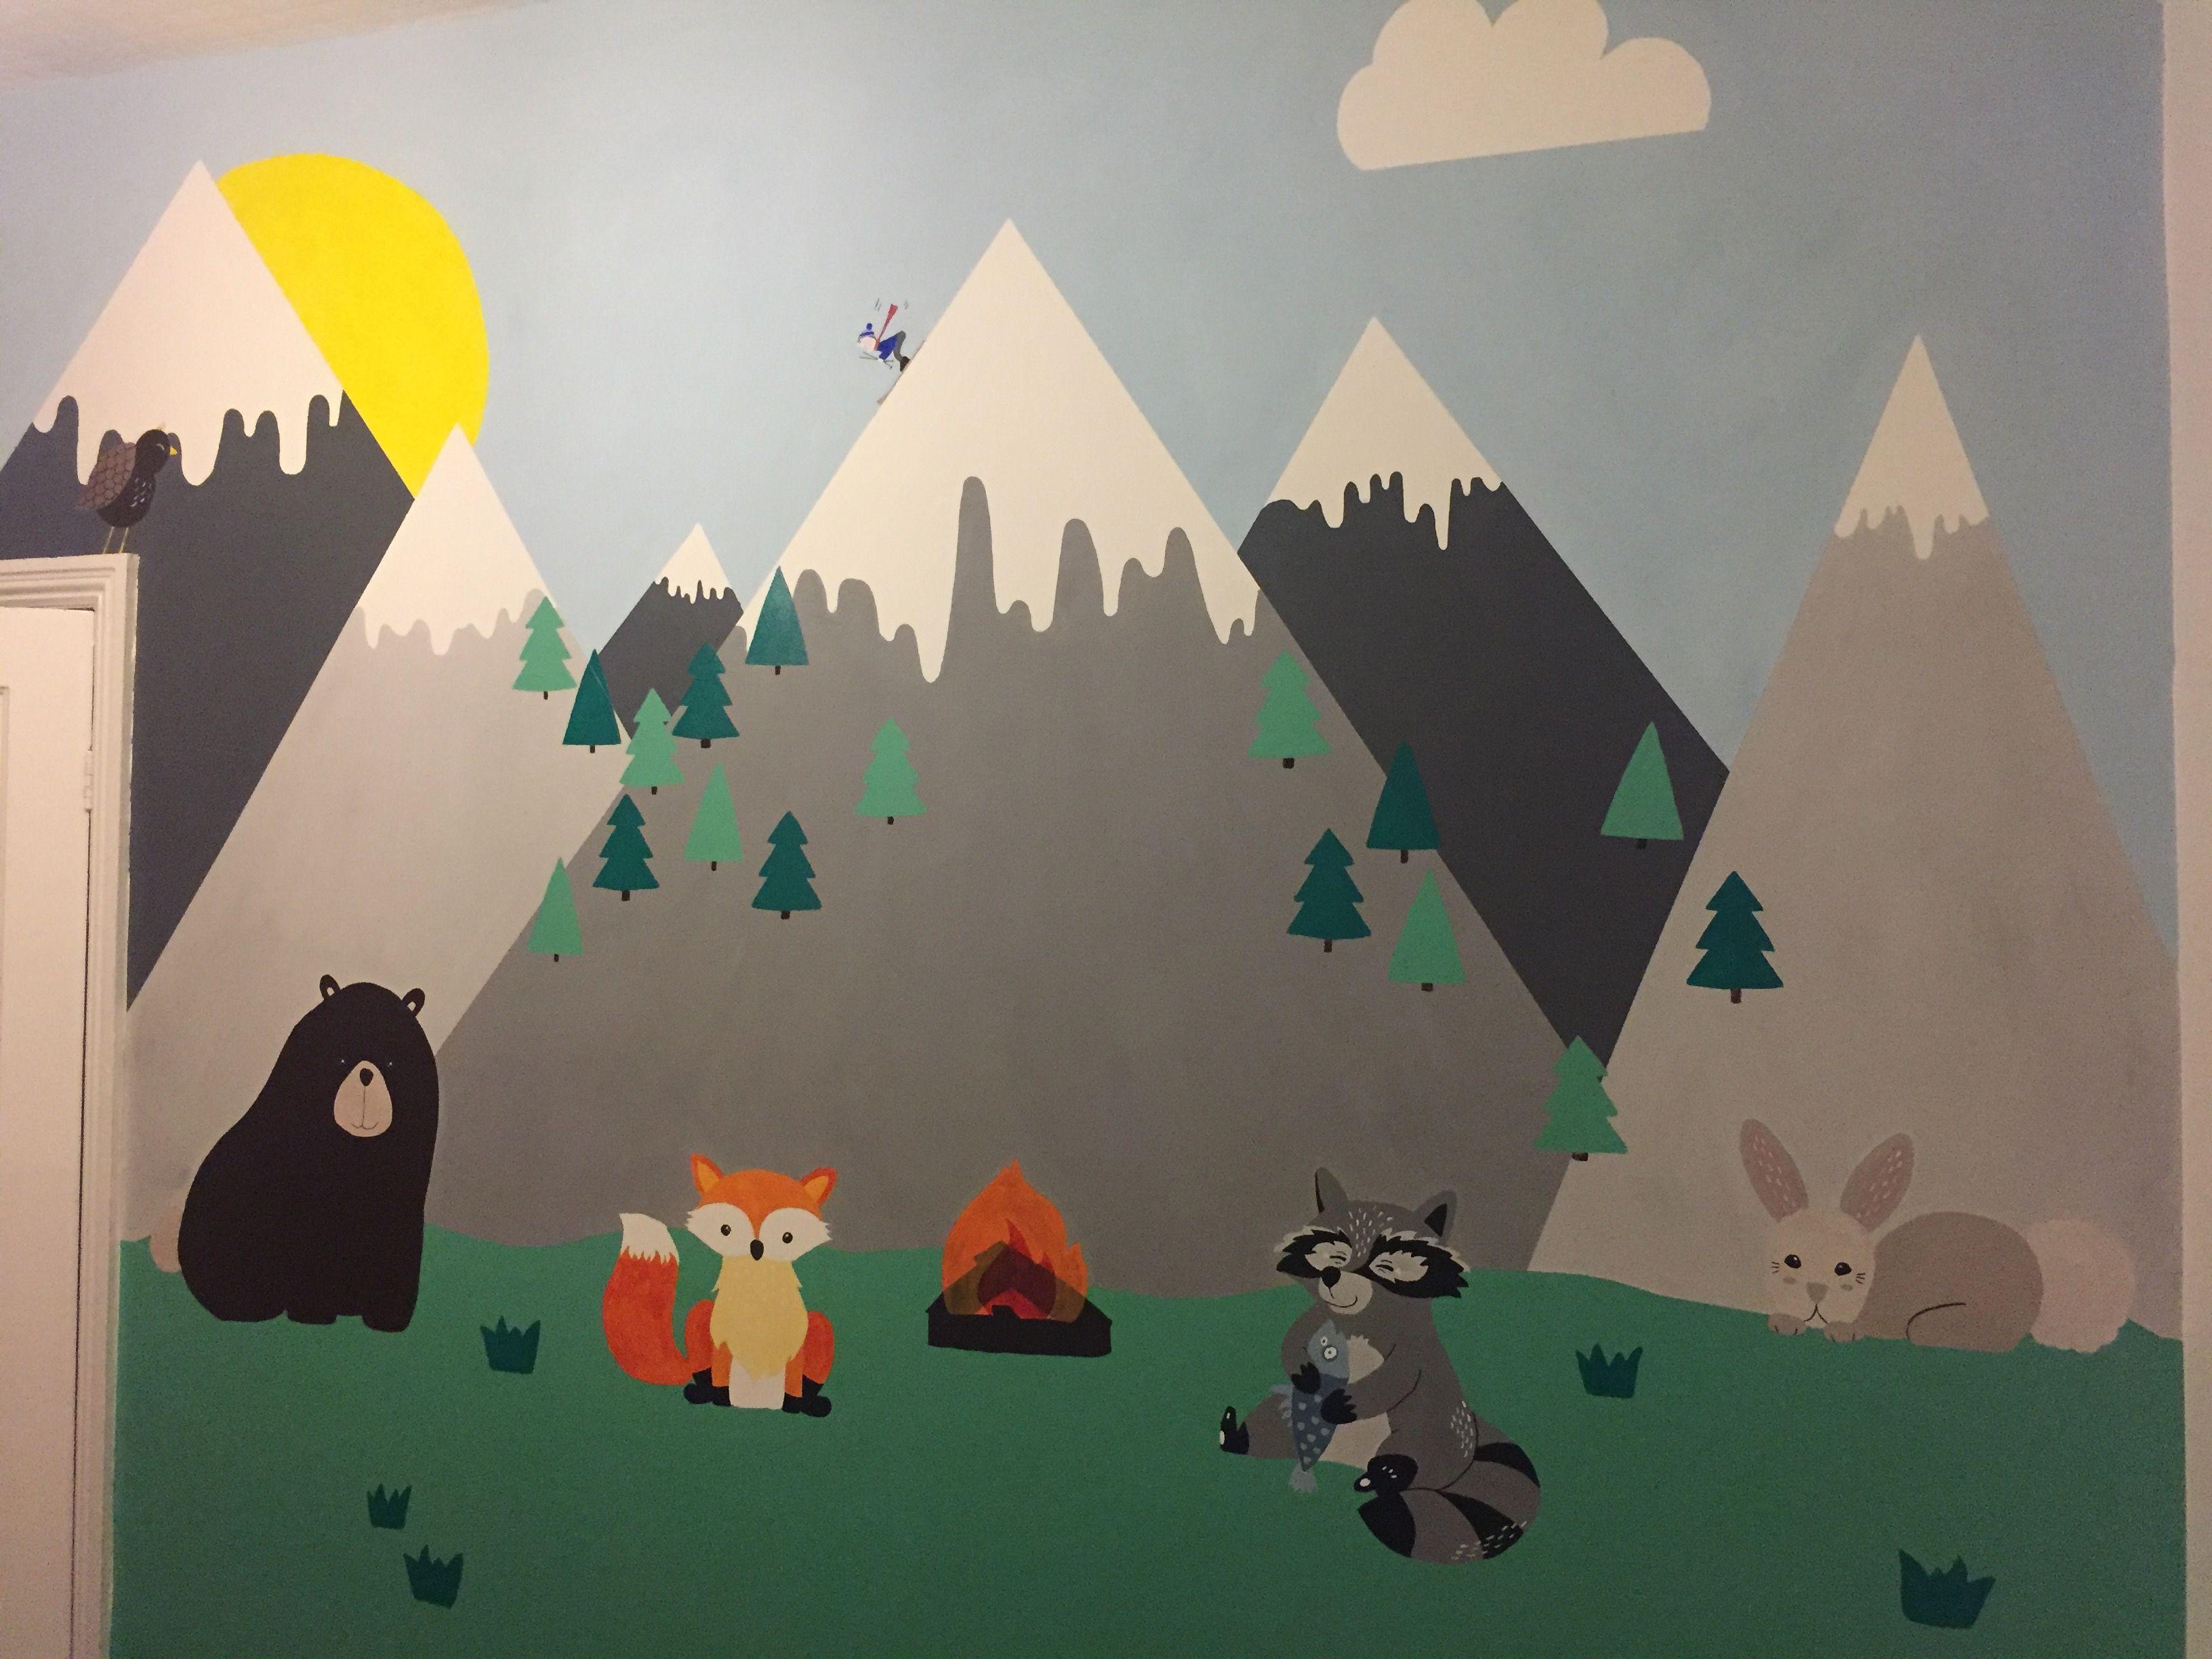 Mountain Woodland Nursery Wall Mural Hand Painted Kids Room